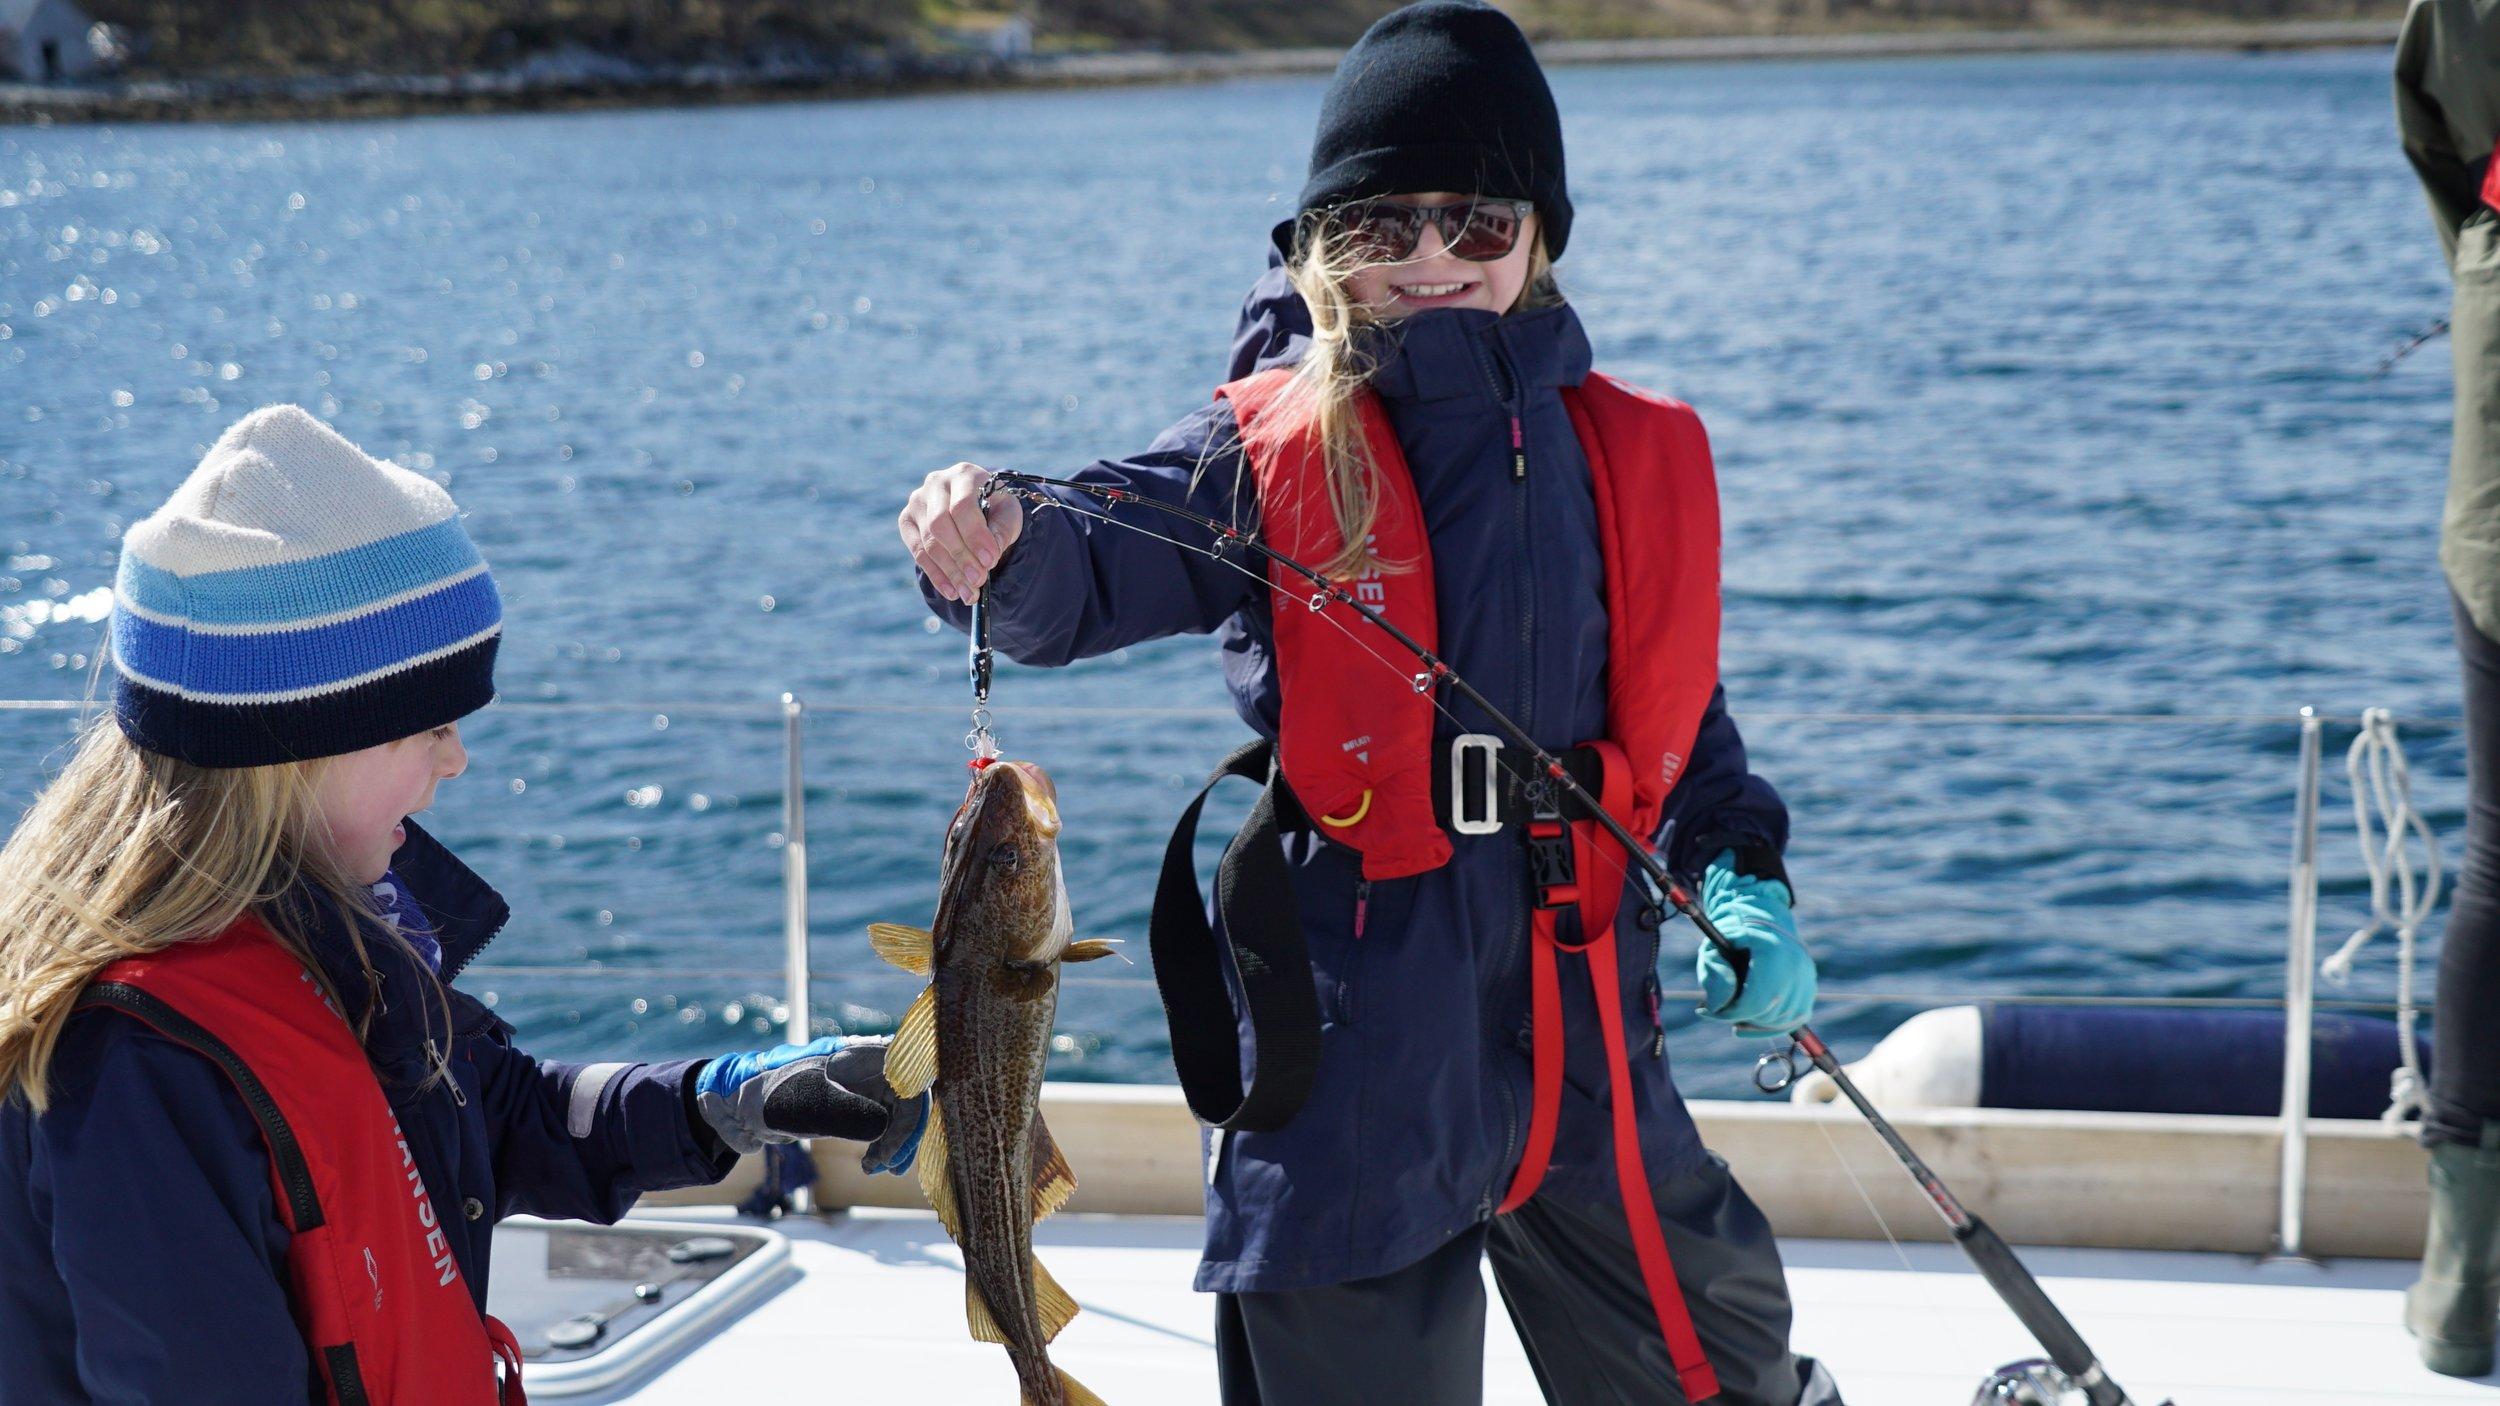 #Fisketur |#Tromsø | Arctic Princess